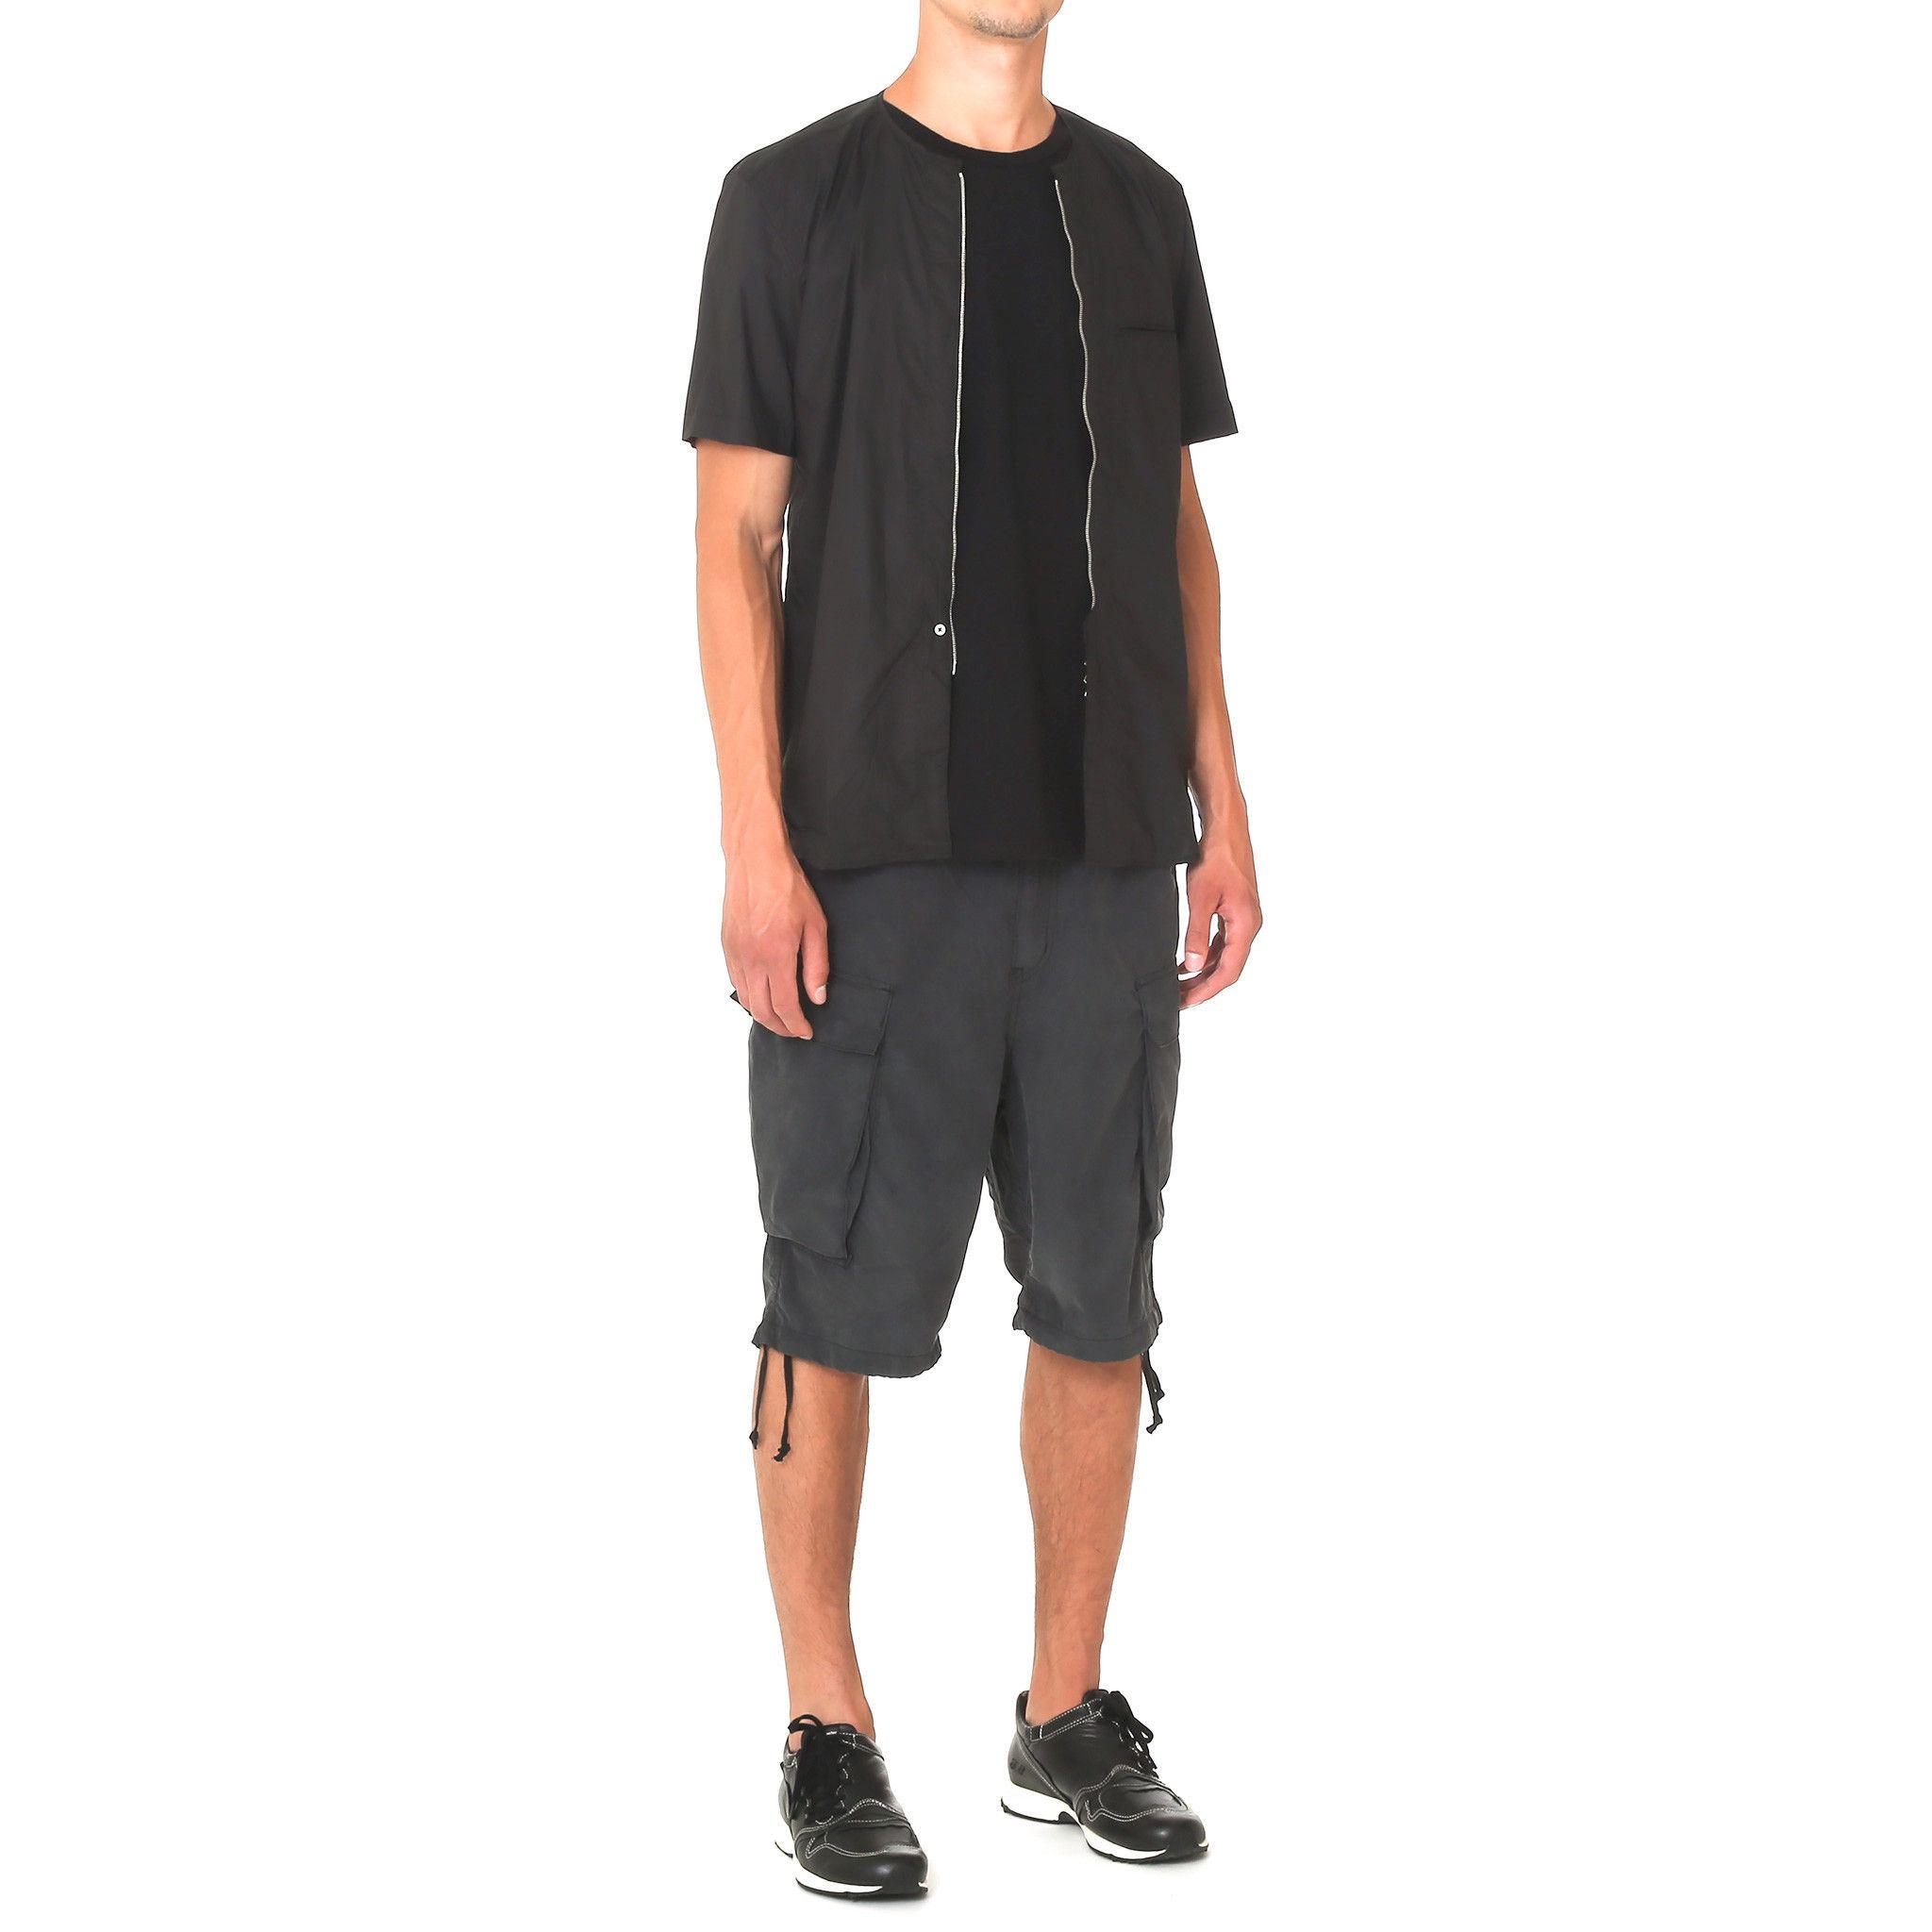 nonnative Trooper Shorts - C/P Weather Cloth Black